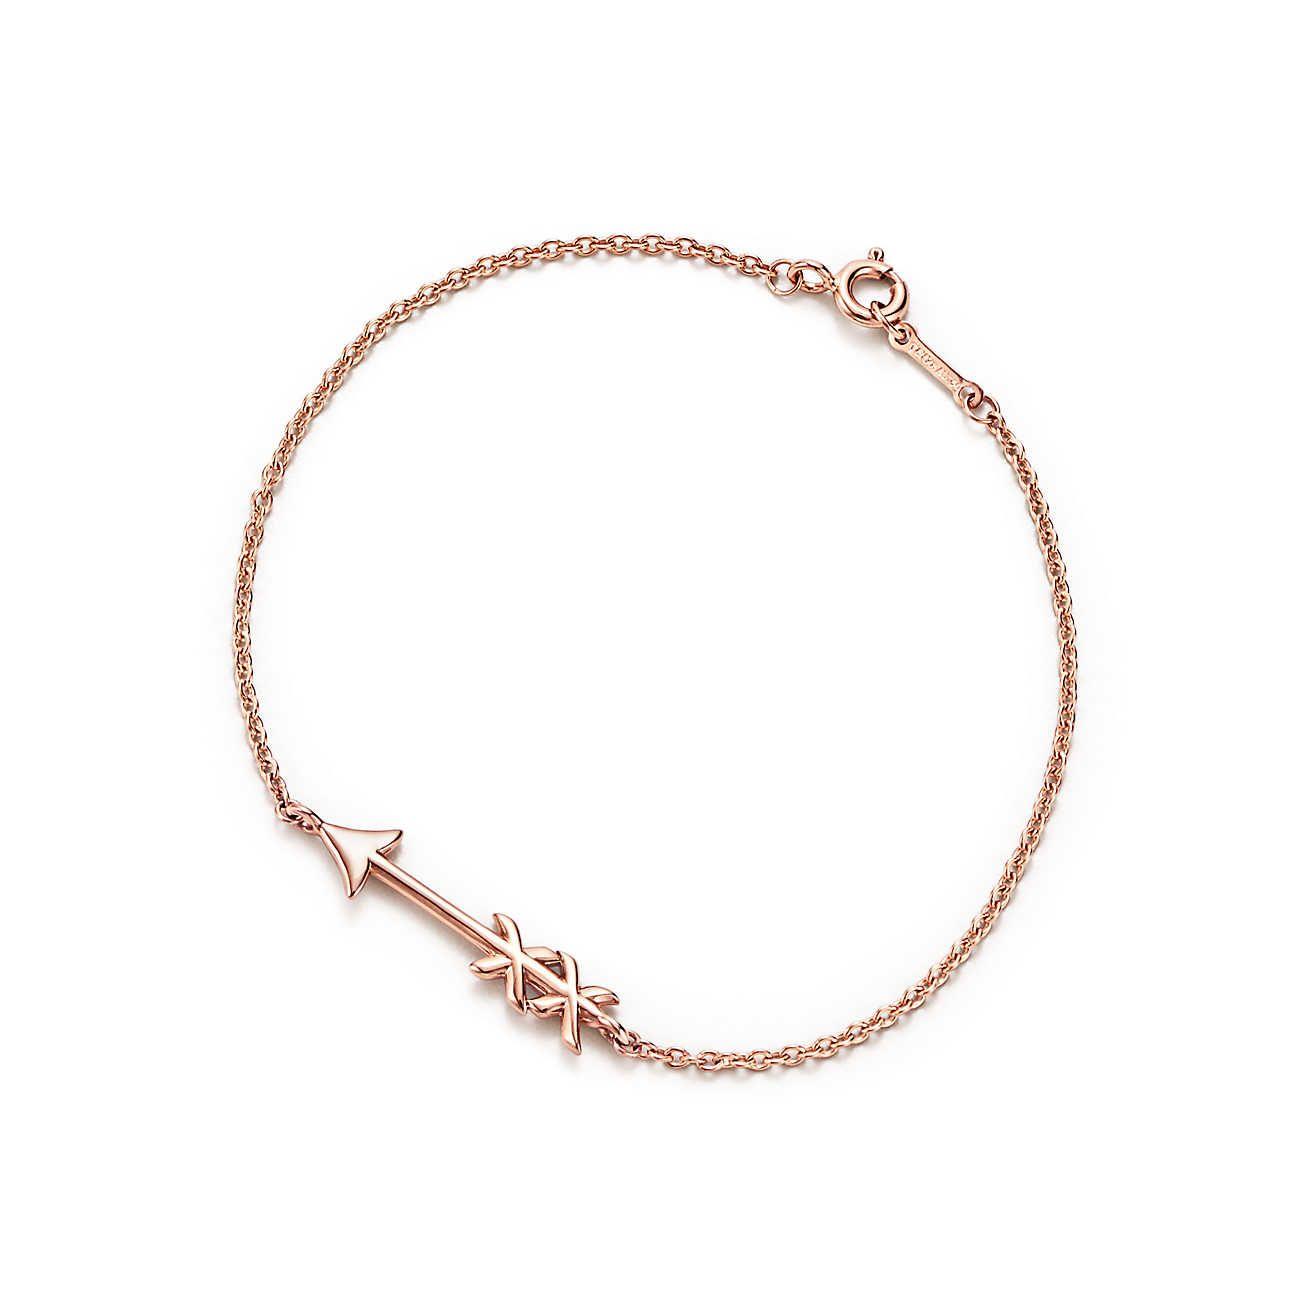 Palomas Graffiti love & kisses bracelet in 18k rose gold, medium Tiffany & Co.